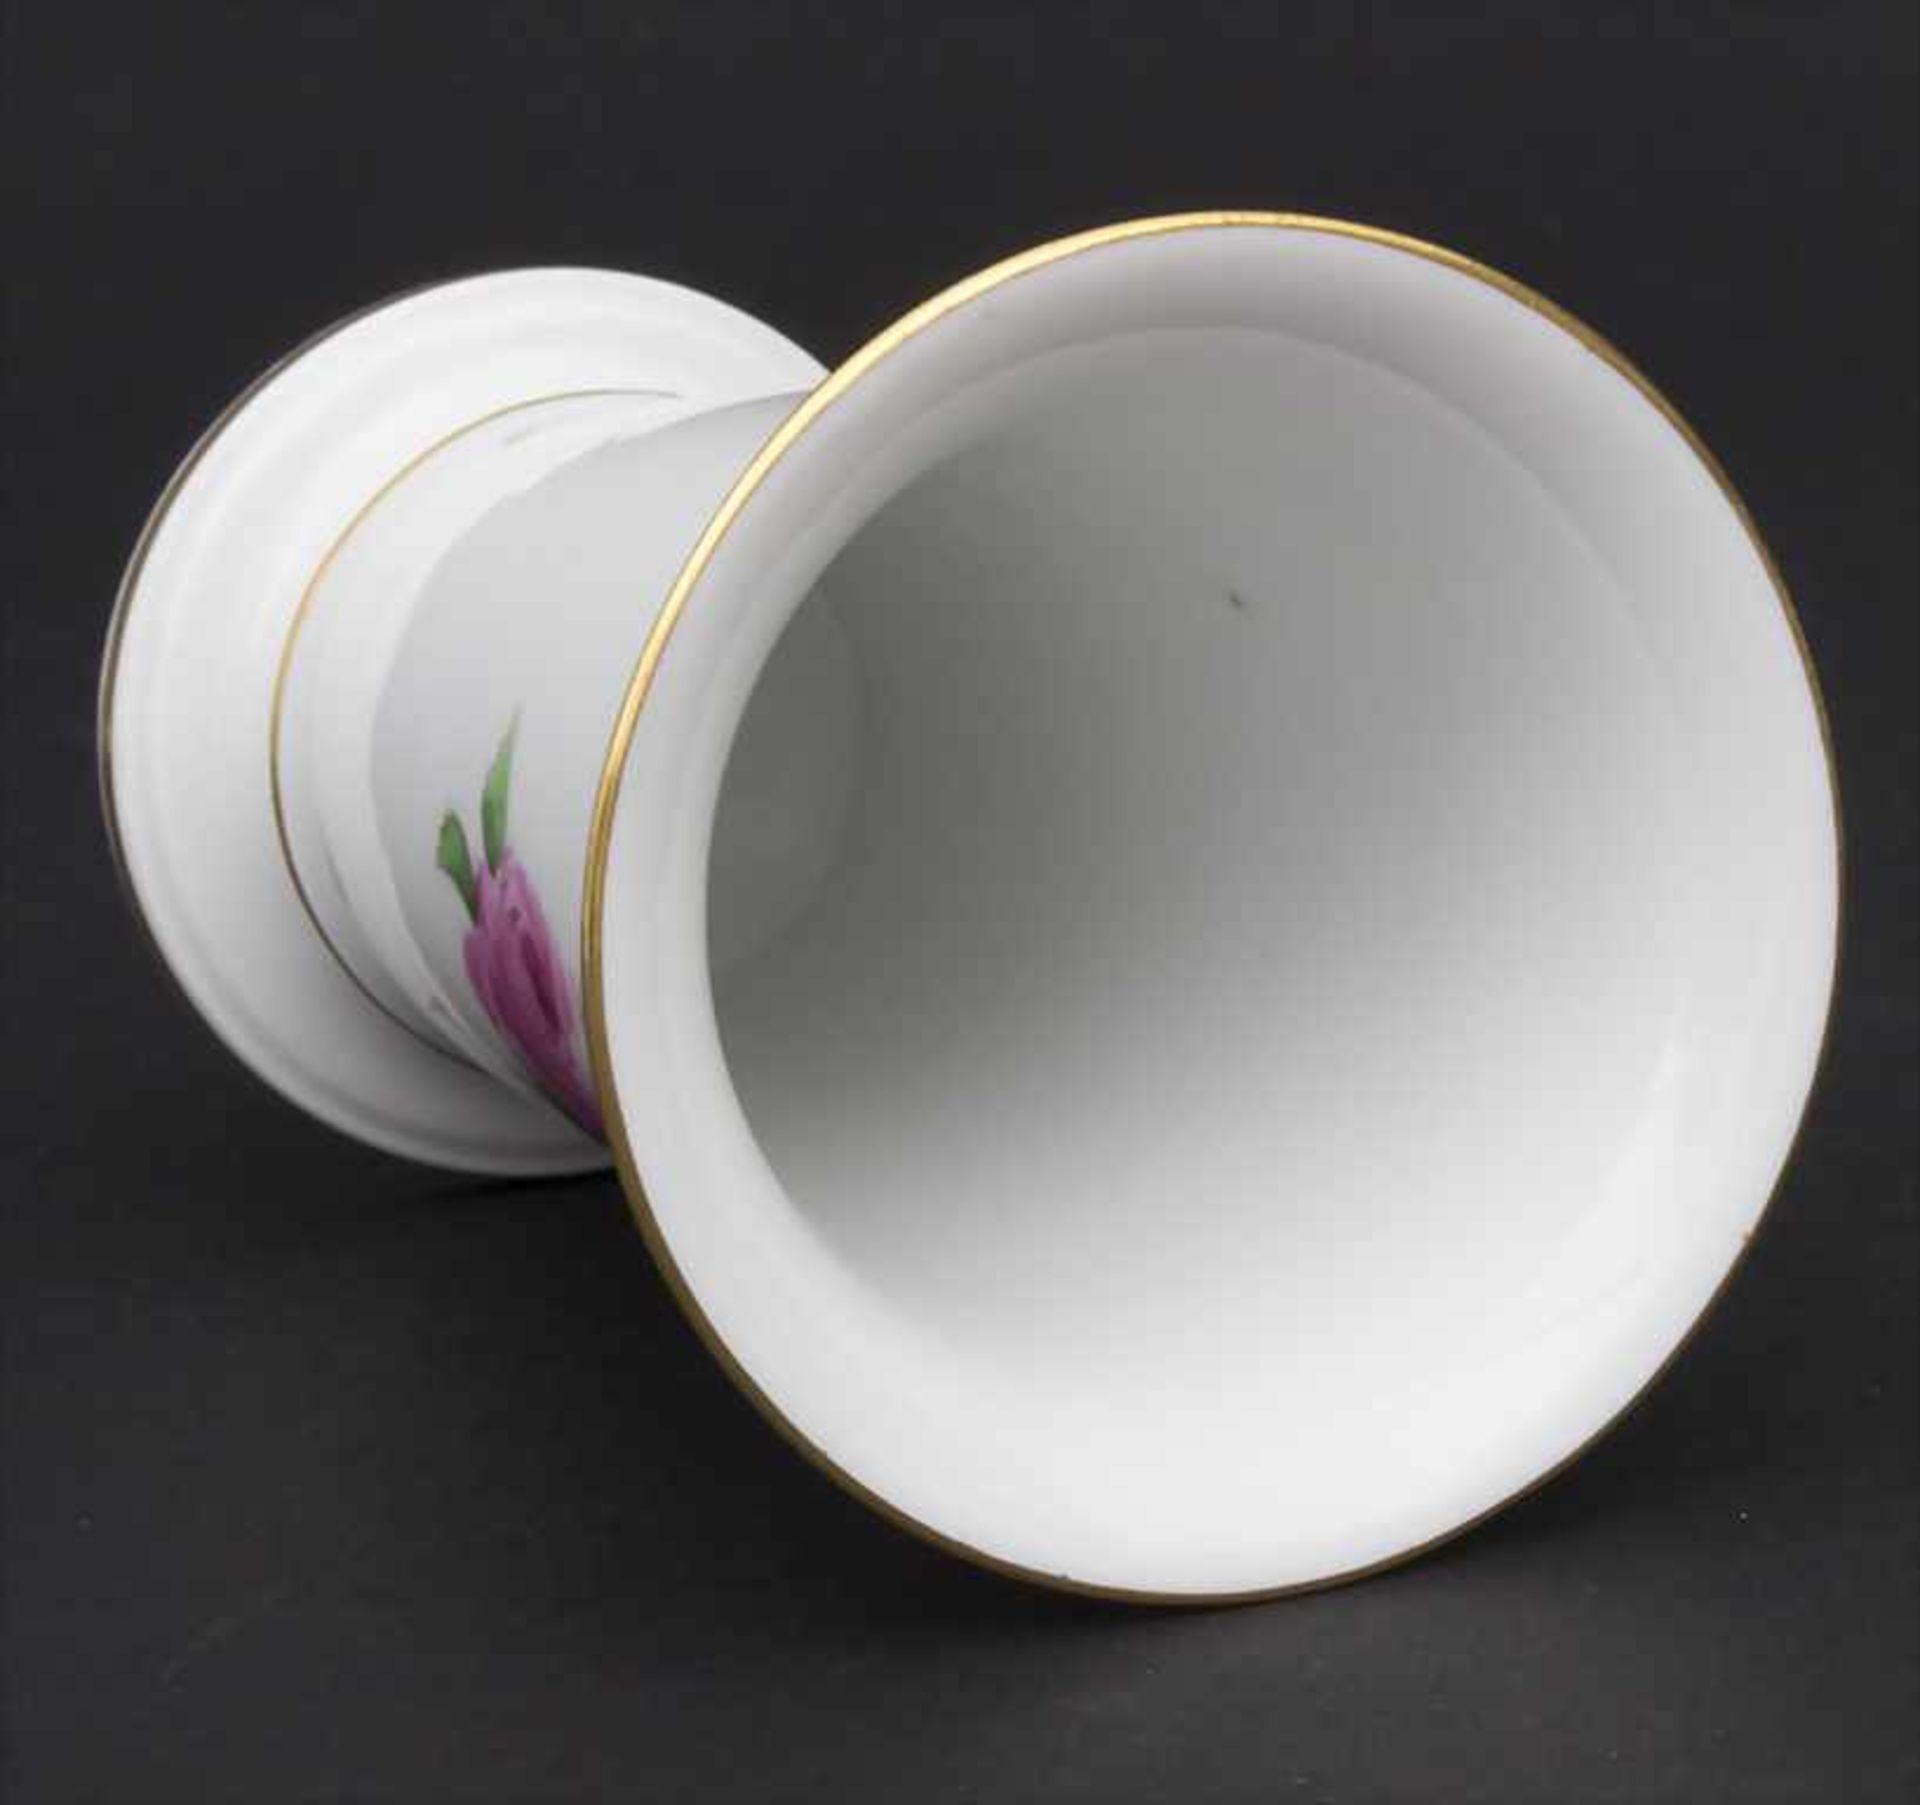 Konvolut Porzellane mit Rosendekor / A set of porcelain with roses, Meissen, 20. Jh. - Bild 4 aus 13